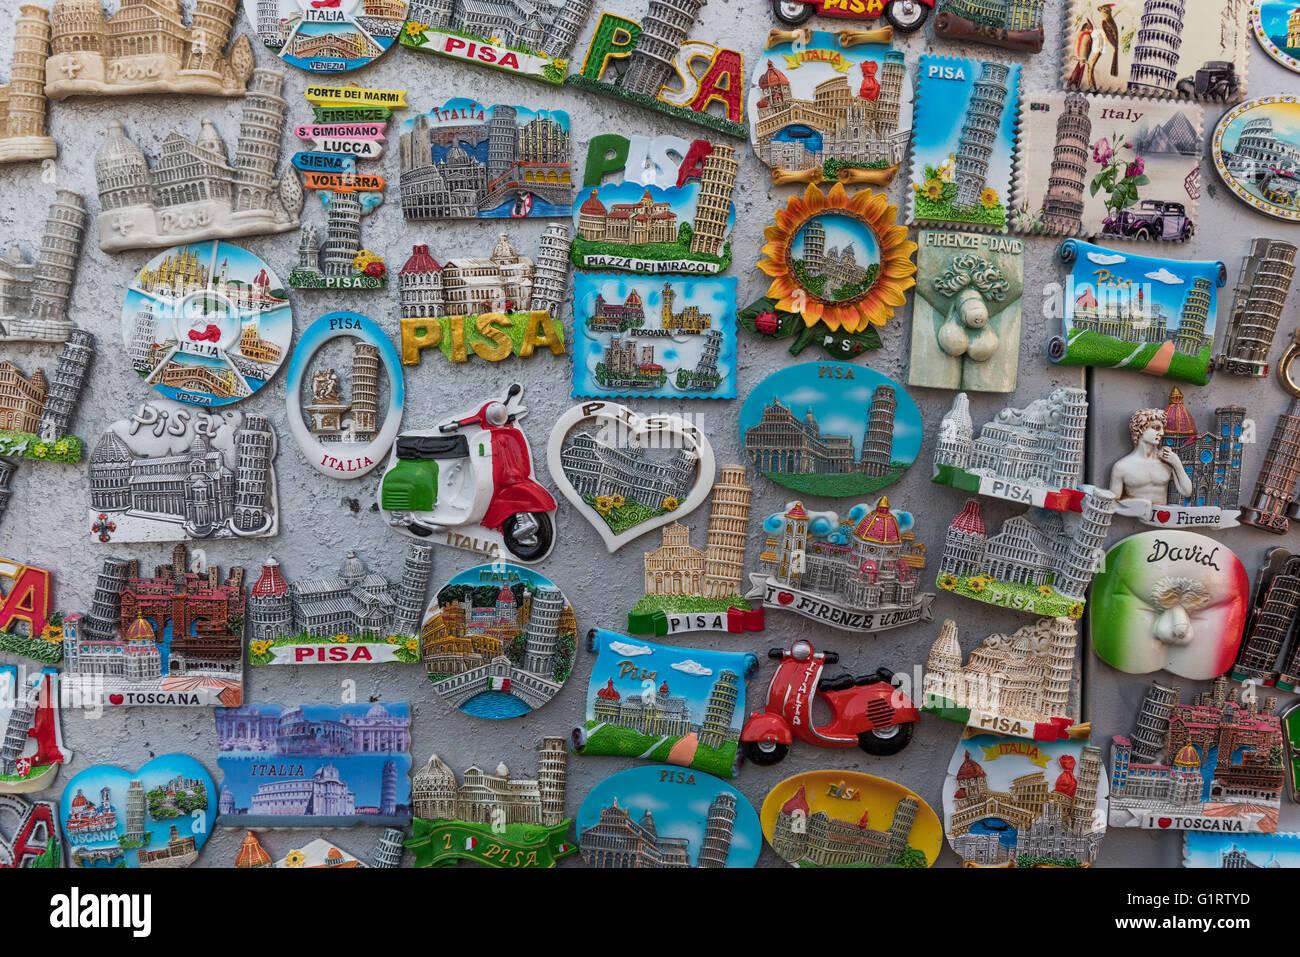 Magnets, keepsake, souvenir with Italian sights, Province of Pisa, Tuscany, Italy - Stock Image